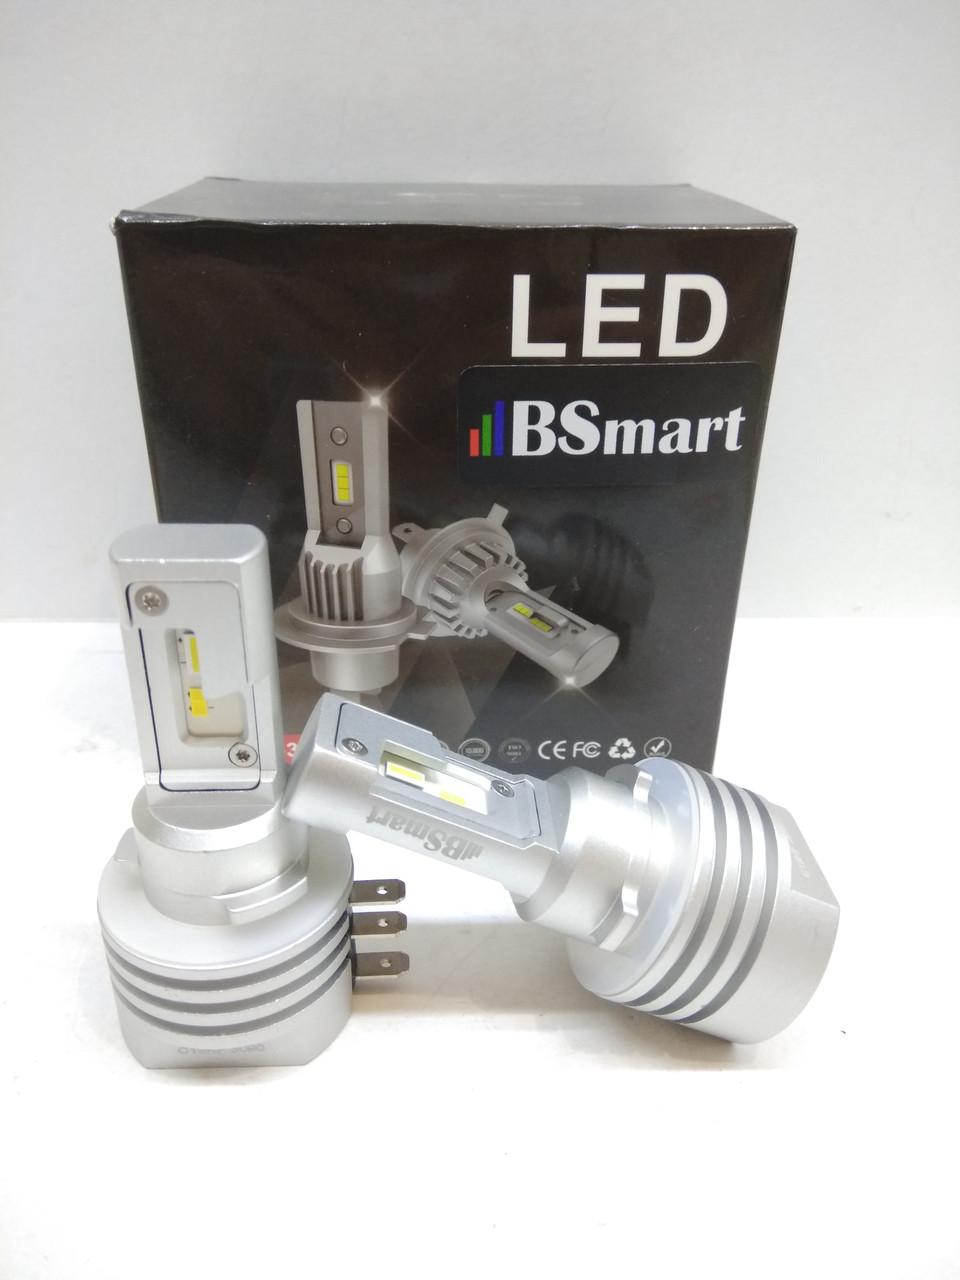 LED автолампи діодні S11P CSP Південна Корея, CANBUS, H15, 8000LM, 30W, 9-32V